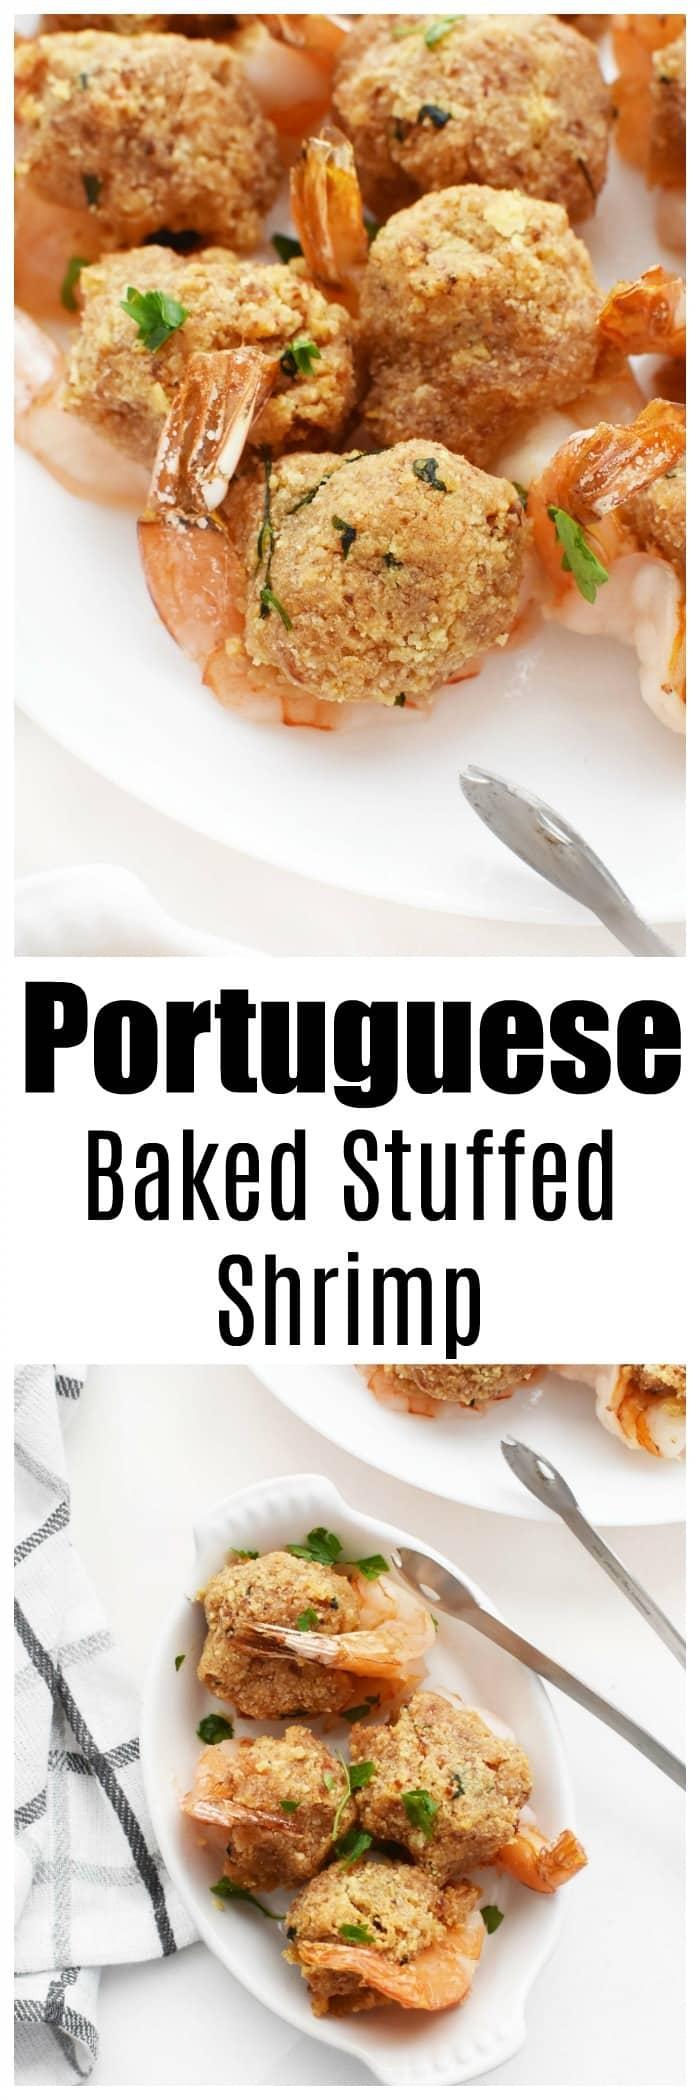 Portuguese Baked Stuffed Shrimp Recipe